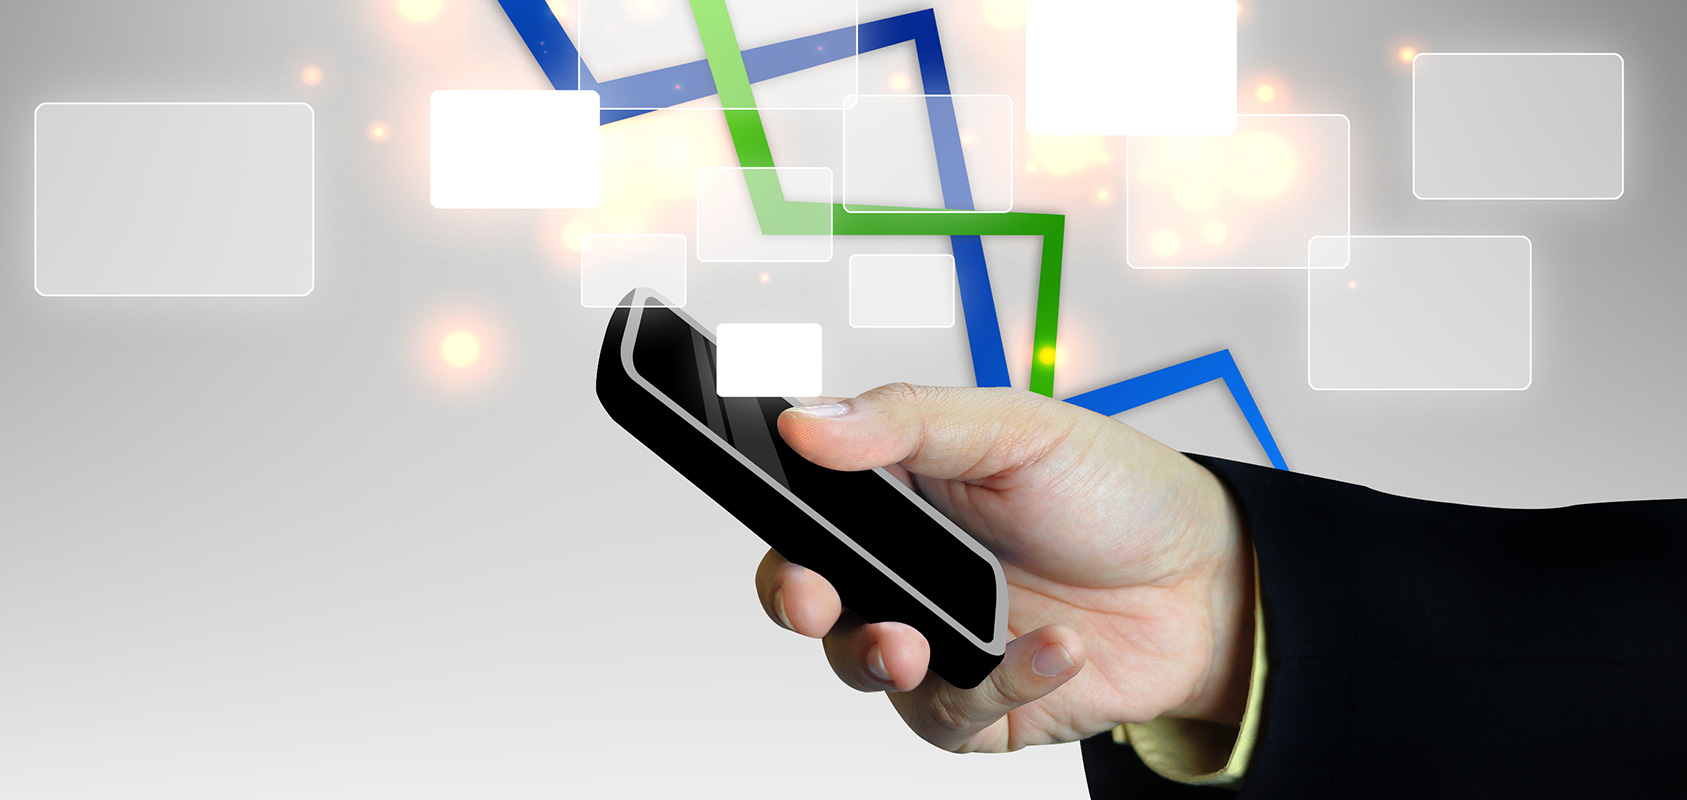 Gestion interne des entreprises - applications mobiles